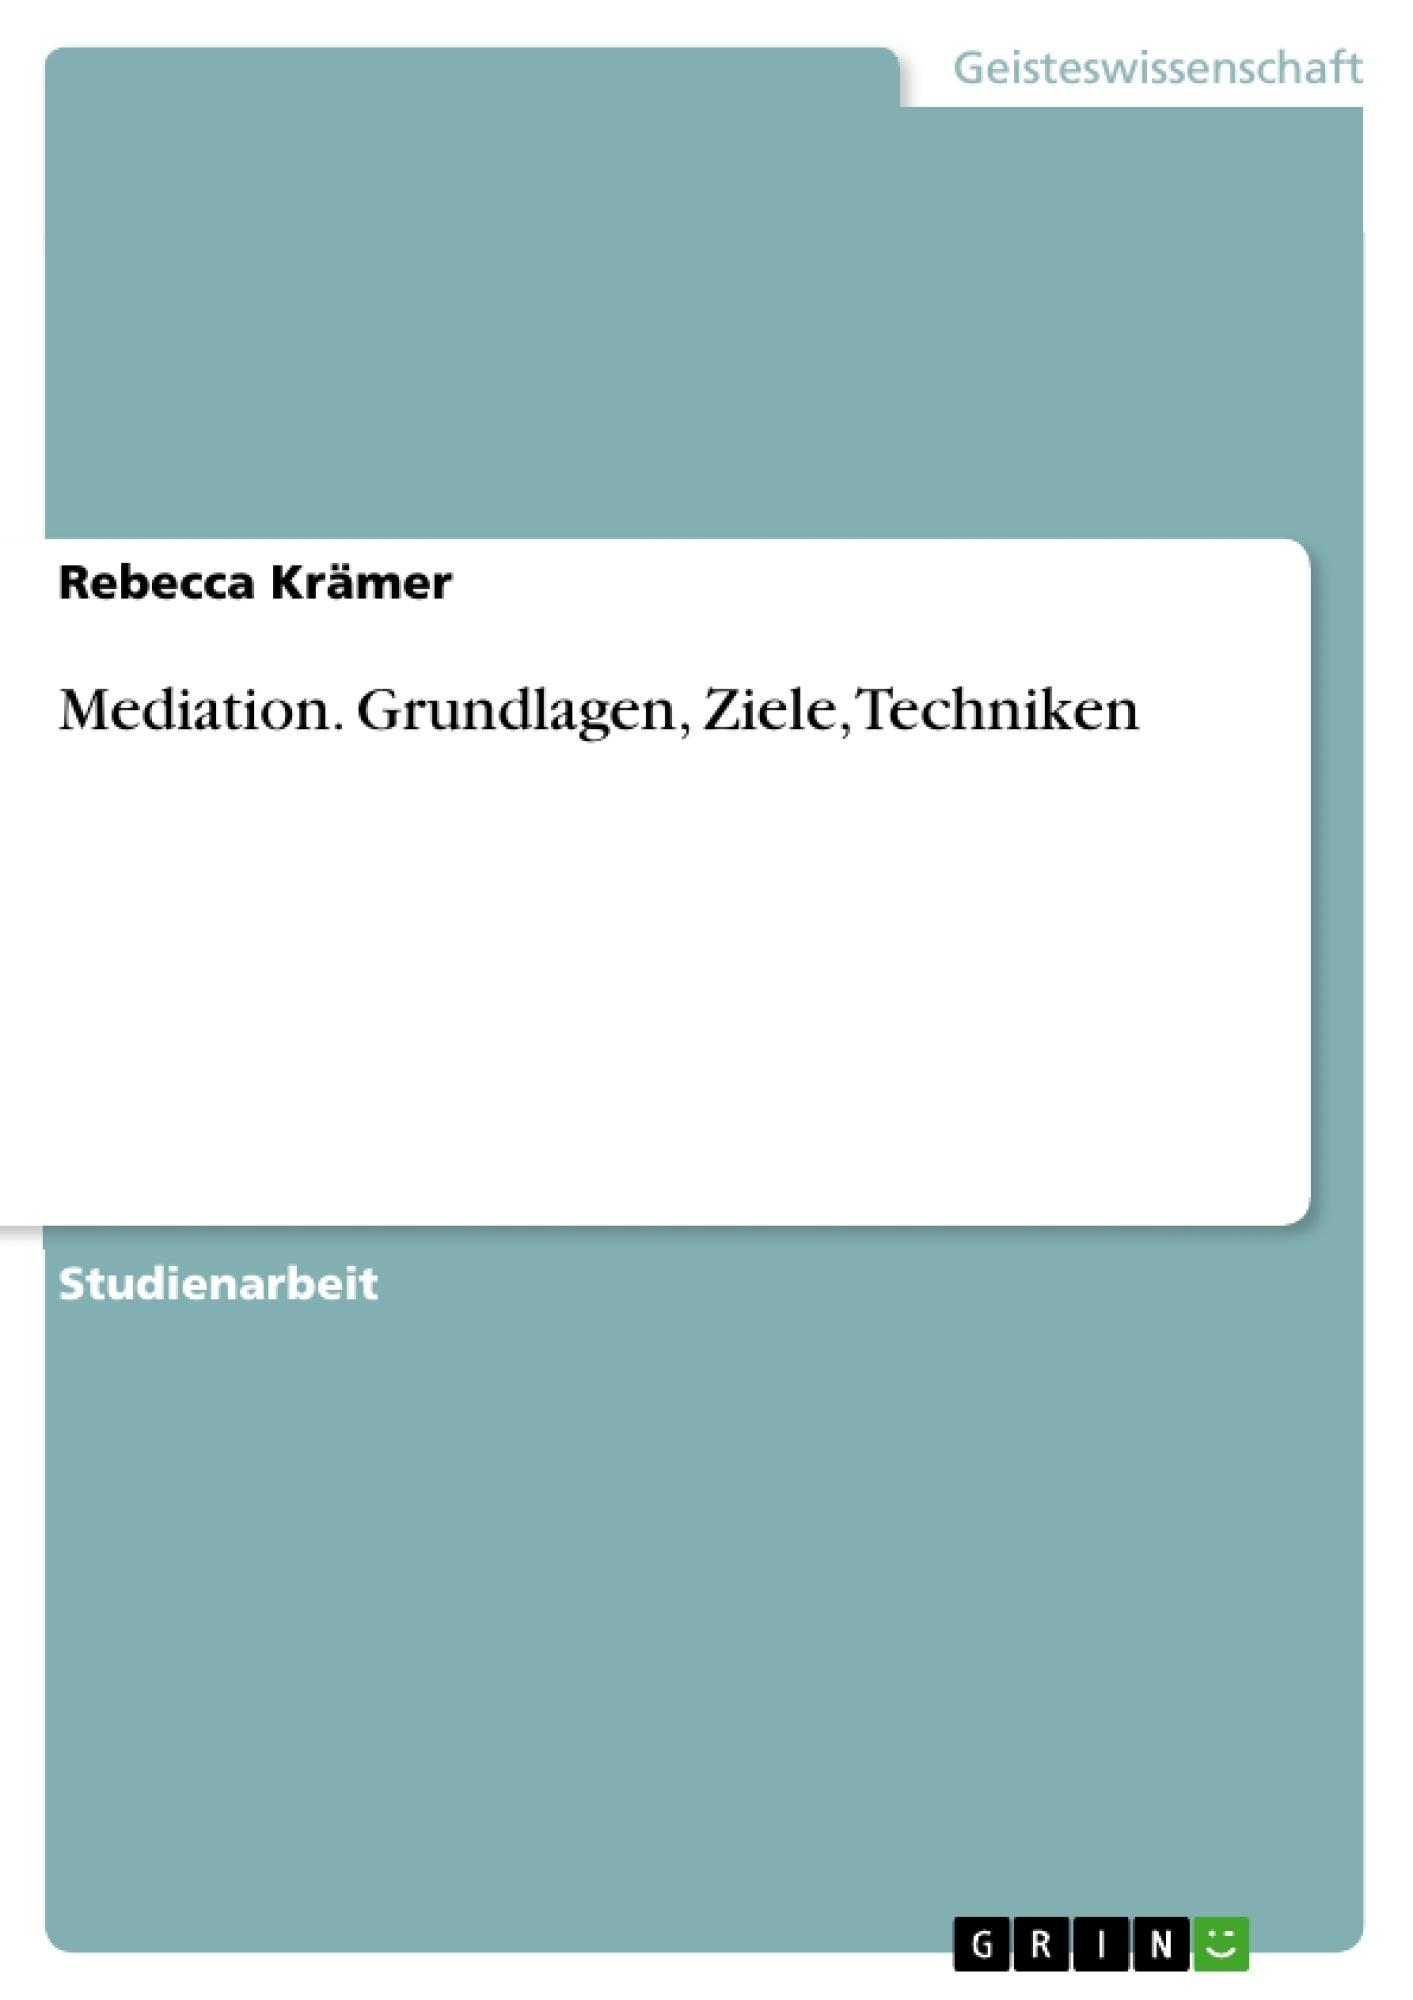 Titel: Mediation. Grundlagen, Ziele, Techniken